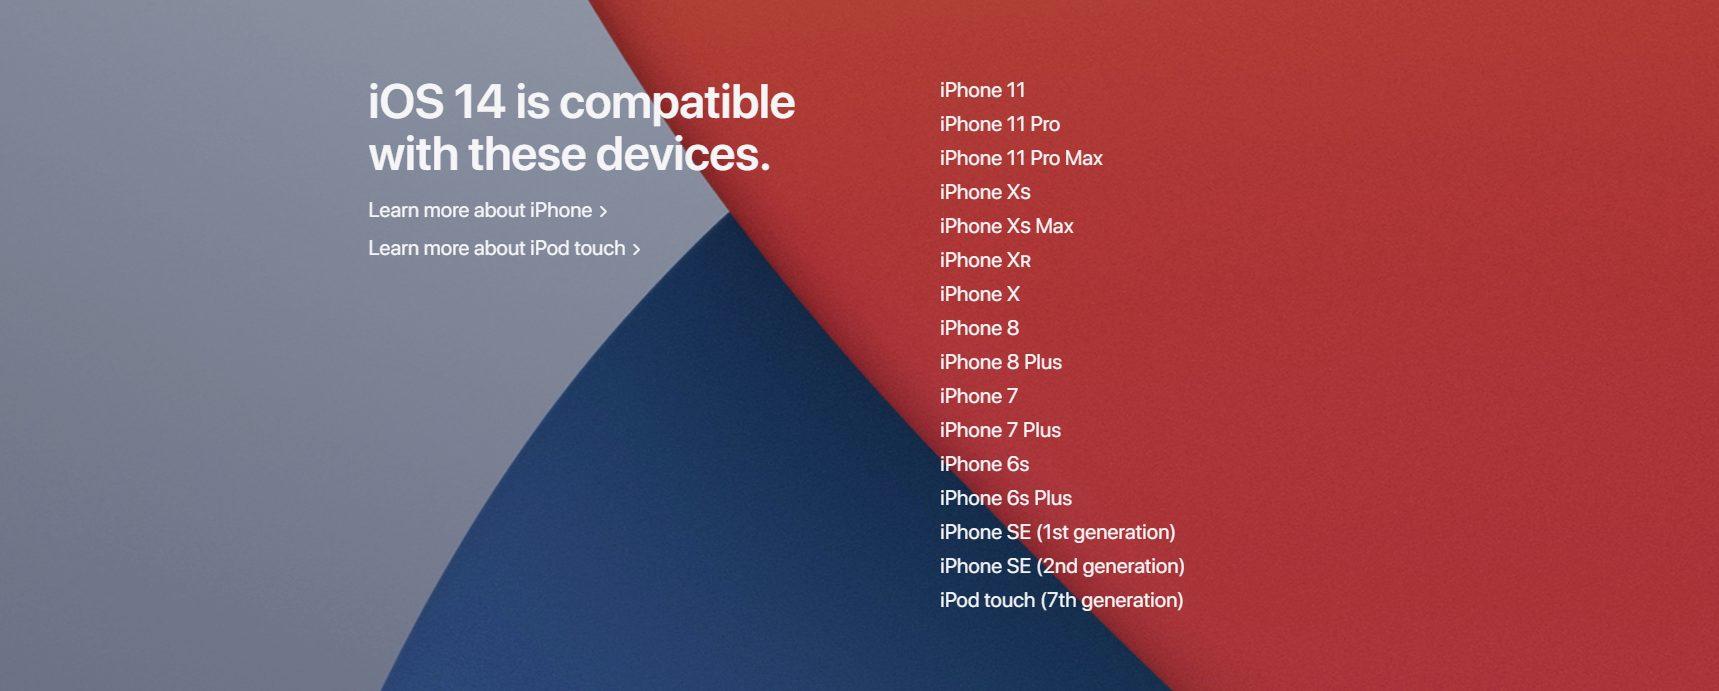 iOS 14 compatibility